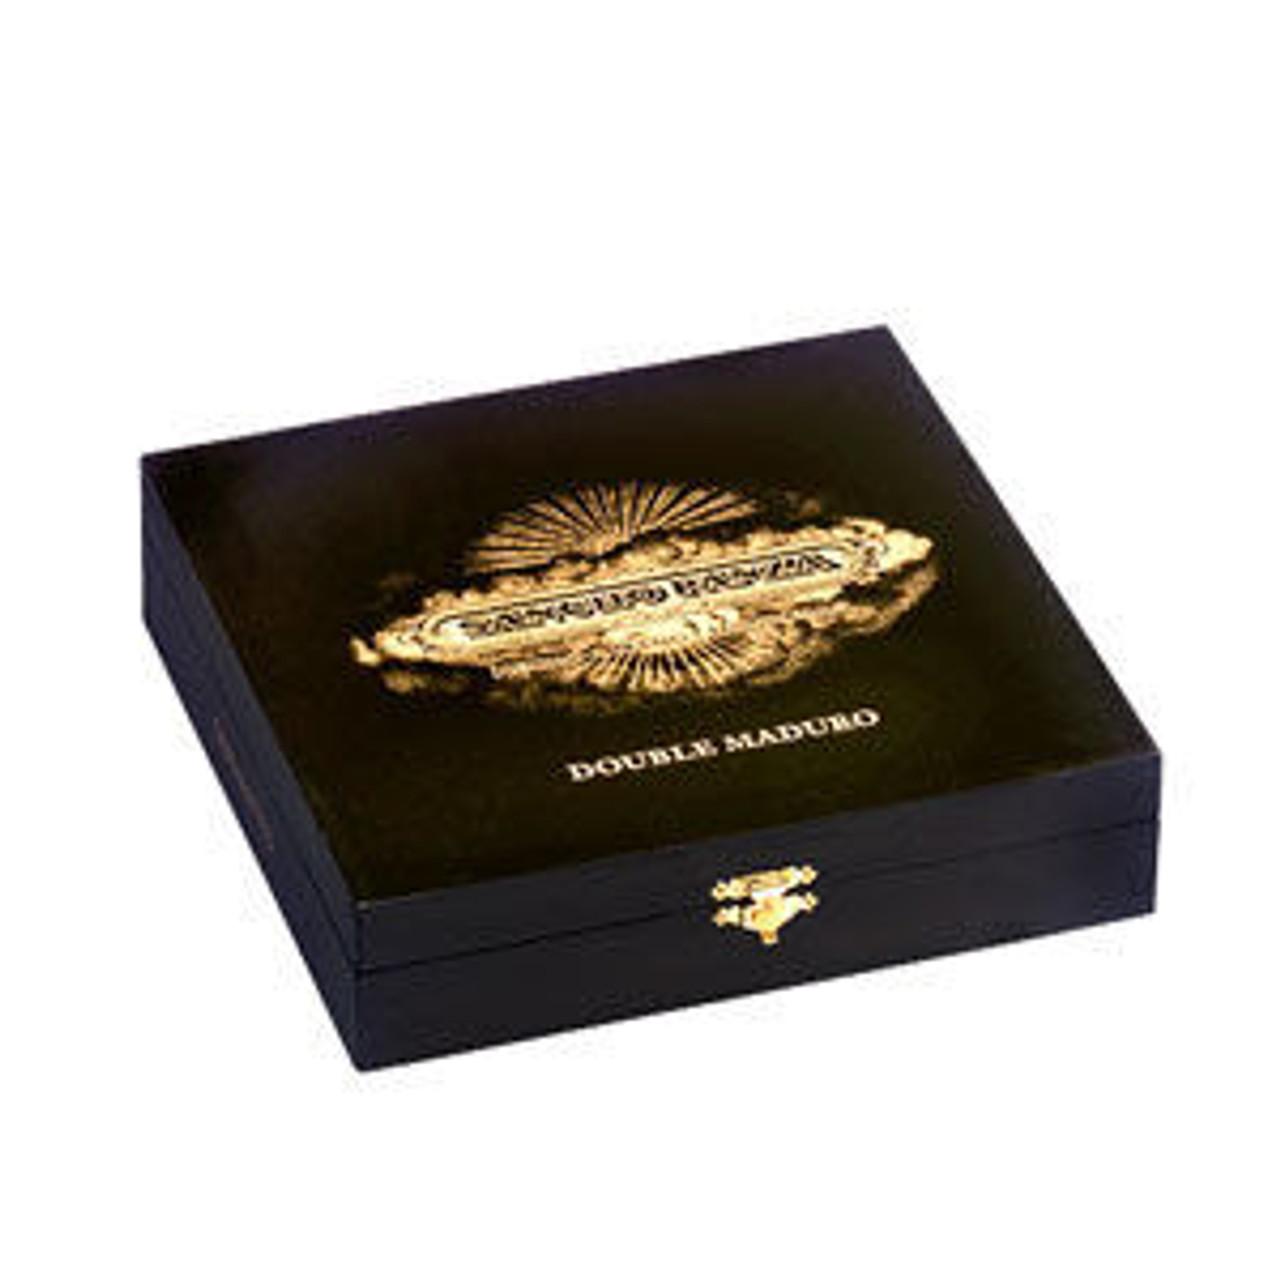 Sancho Panza Double Maduro Cervantes Cigars - 6 x 48 (Box of 20)